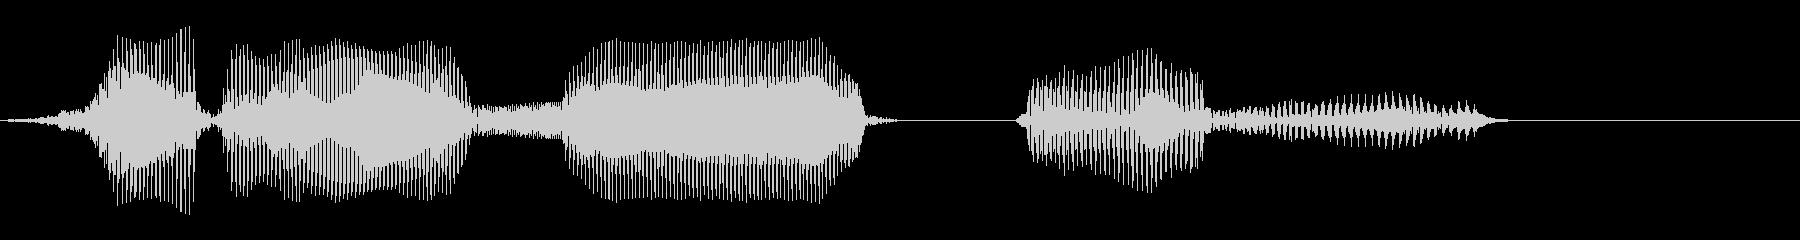 km(キロメートル)の未再生の波形